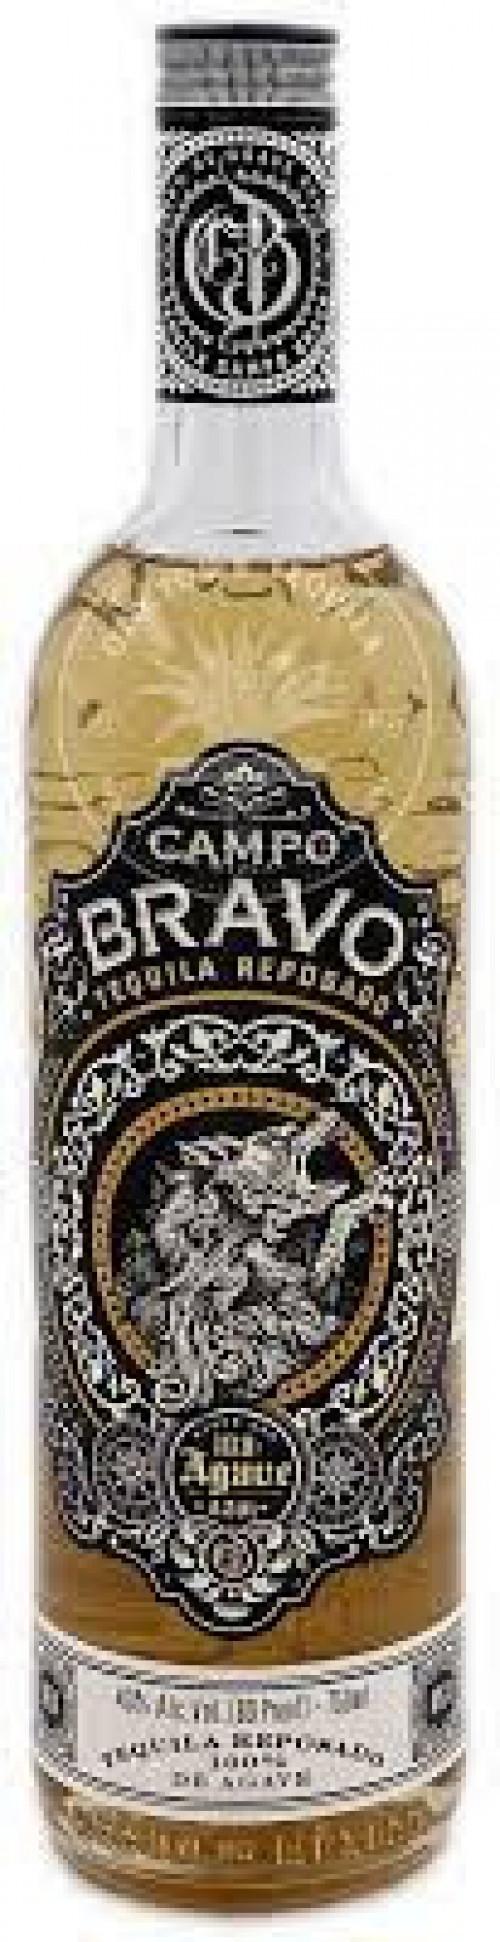 Campo Bravo Reposado Tequila 750ml